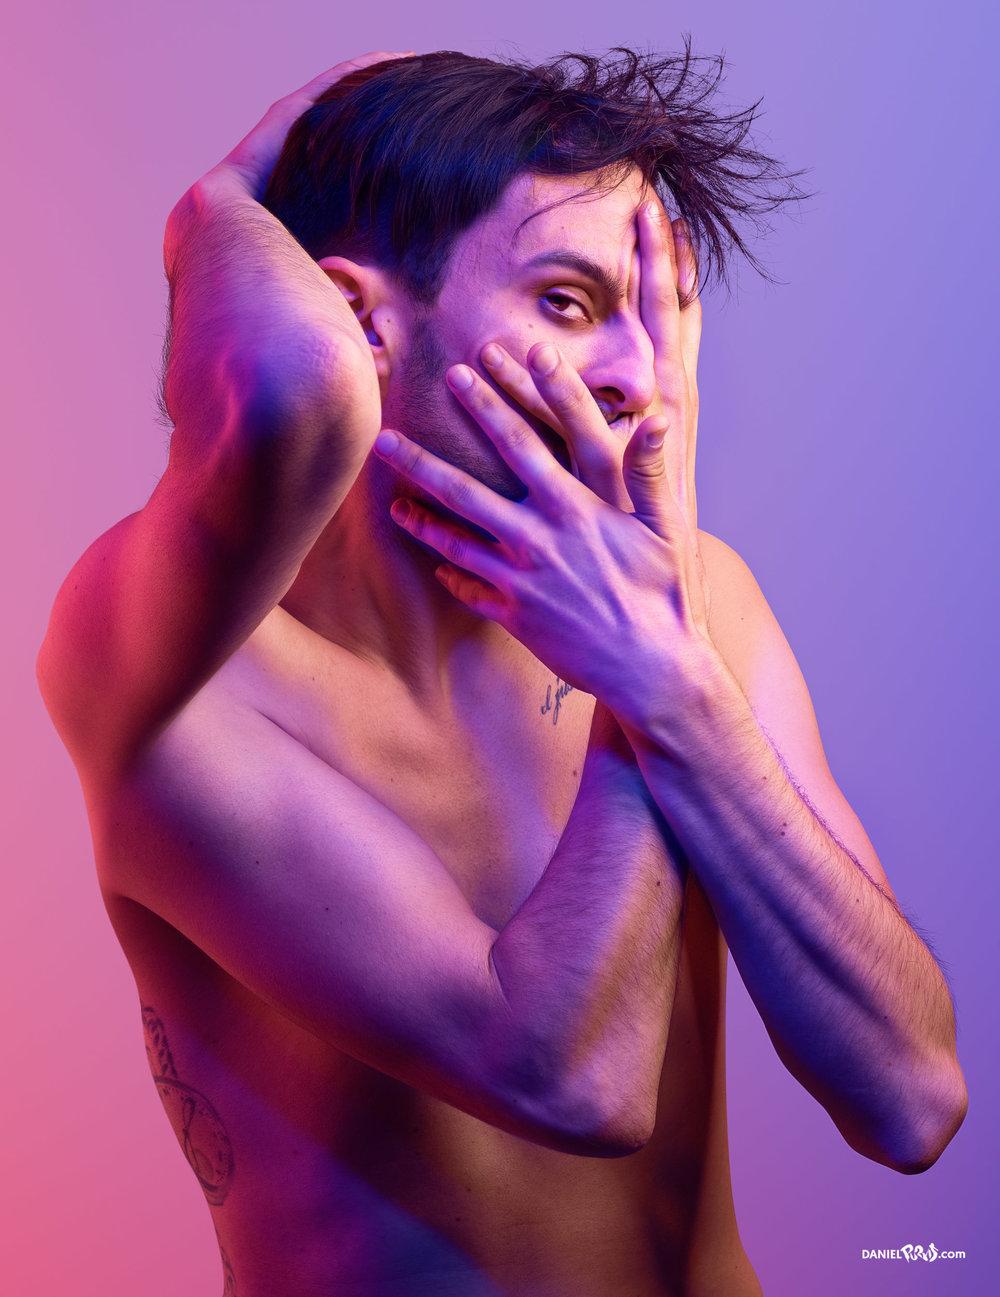 Brodie Turner - Daniel PurvisContorted - Daniel Purvis - DSC_9555.jpg